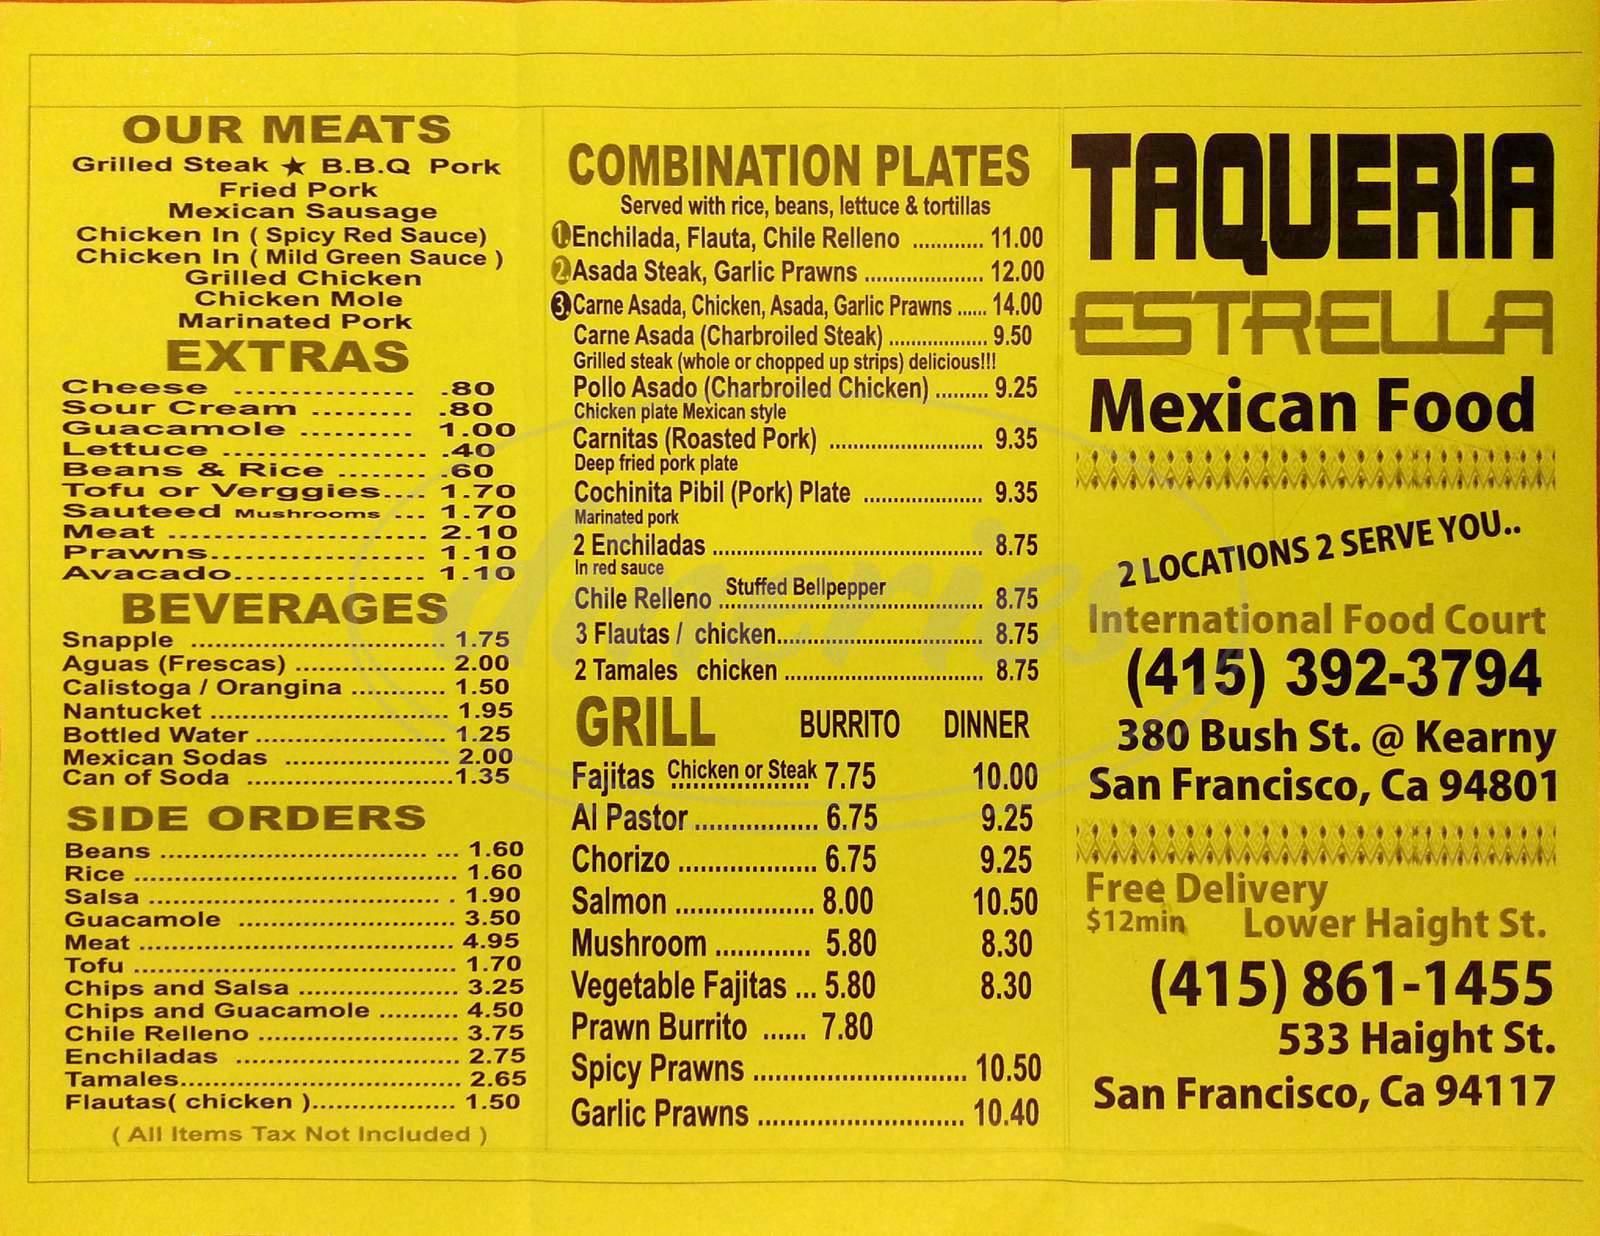 menu for Taqueria Estrella